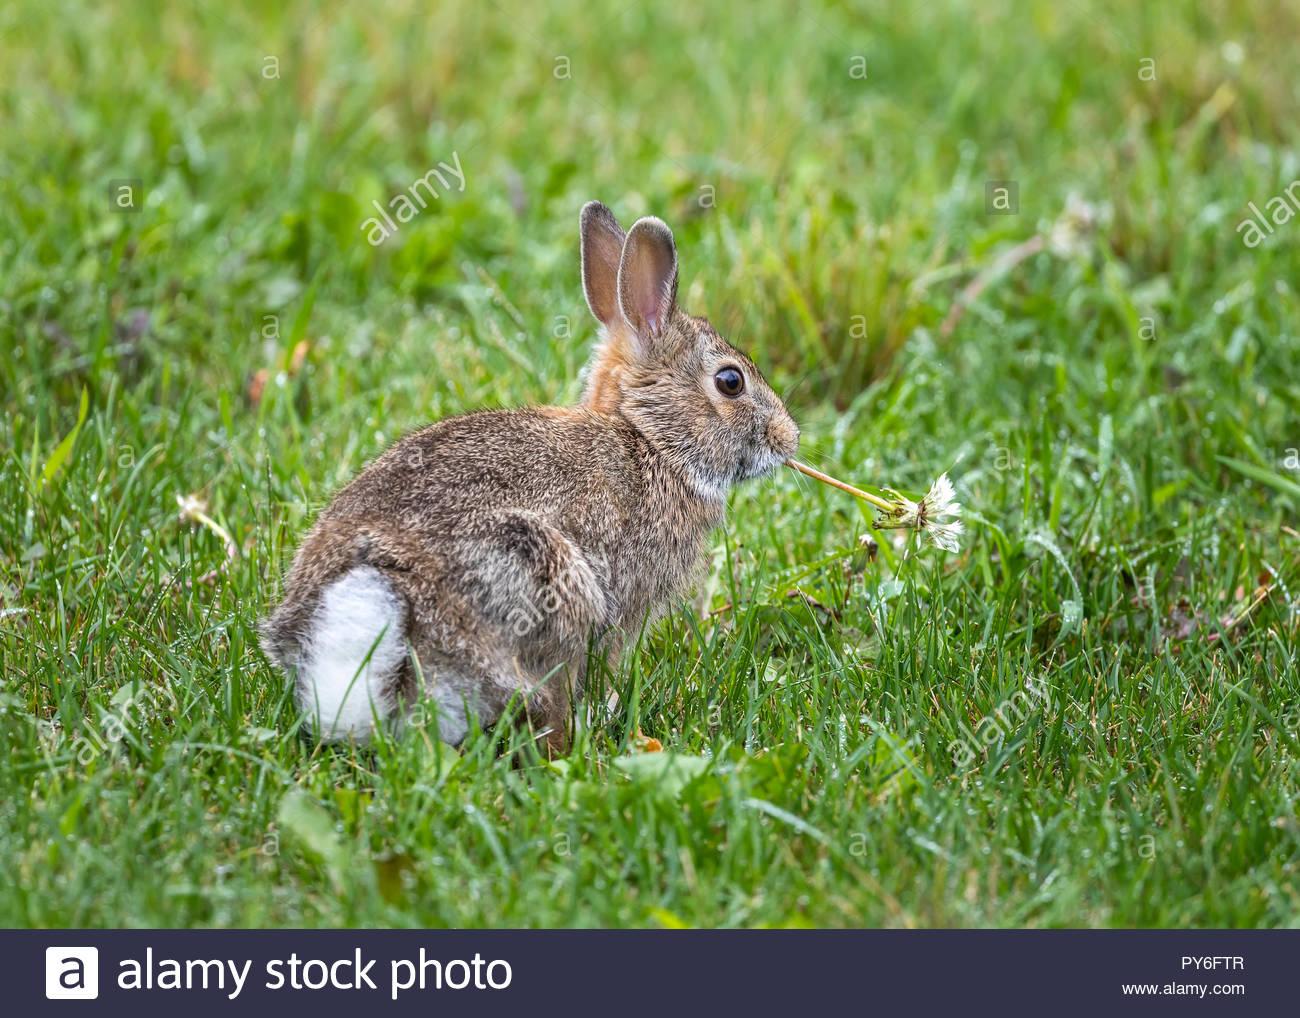 Eastern Cottontail Rabbit, (Sylvilagus floridanus), feeding on weeds, Winnipeg, Manitoba, Canada. - Stock Image